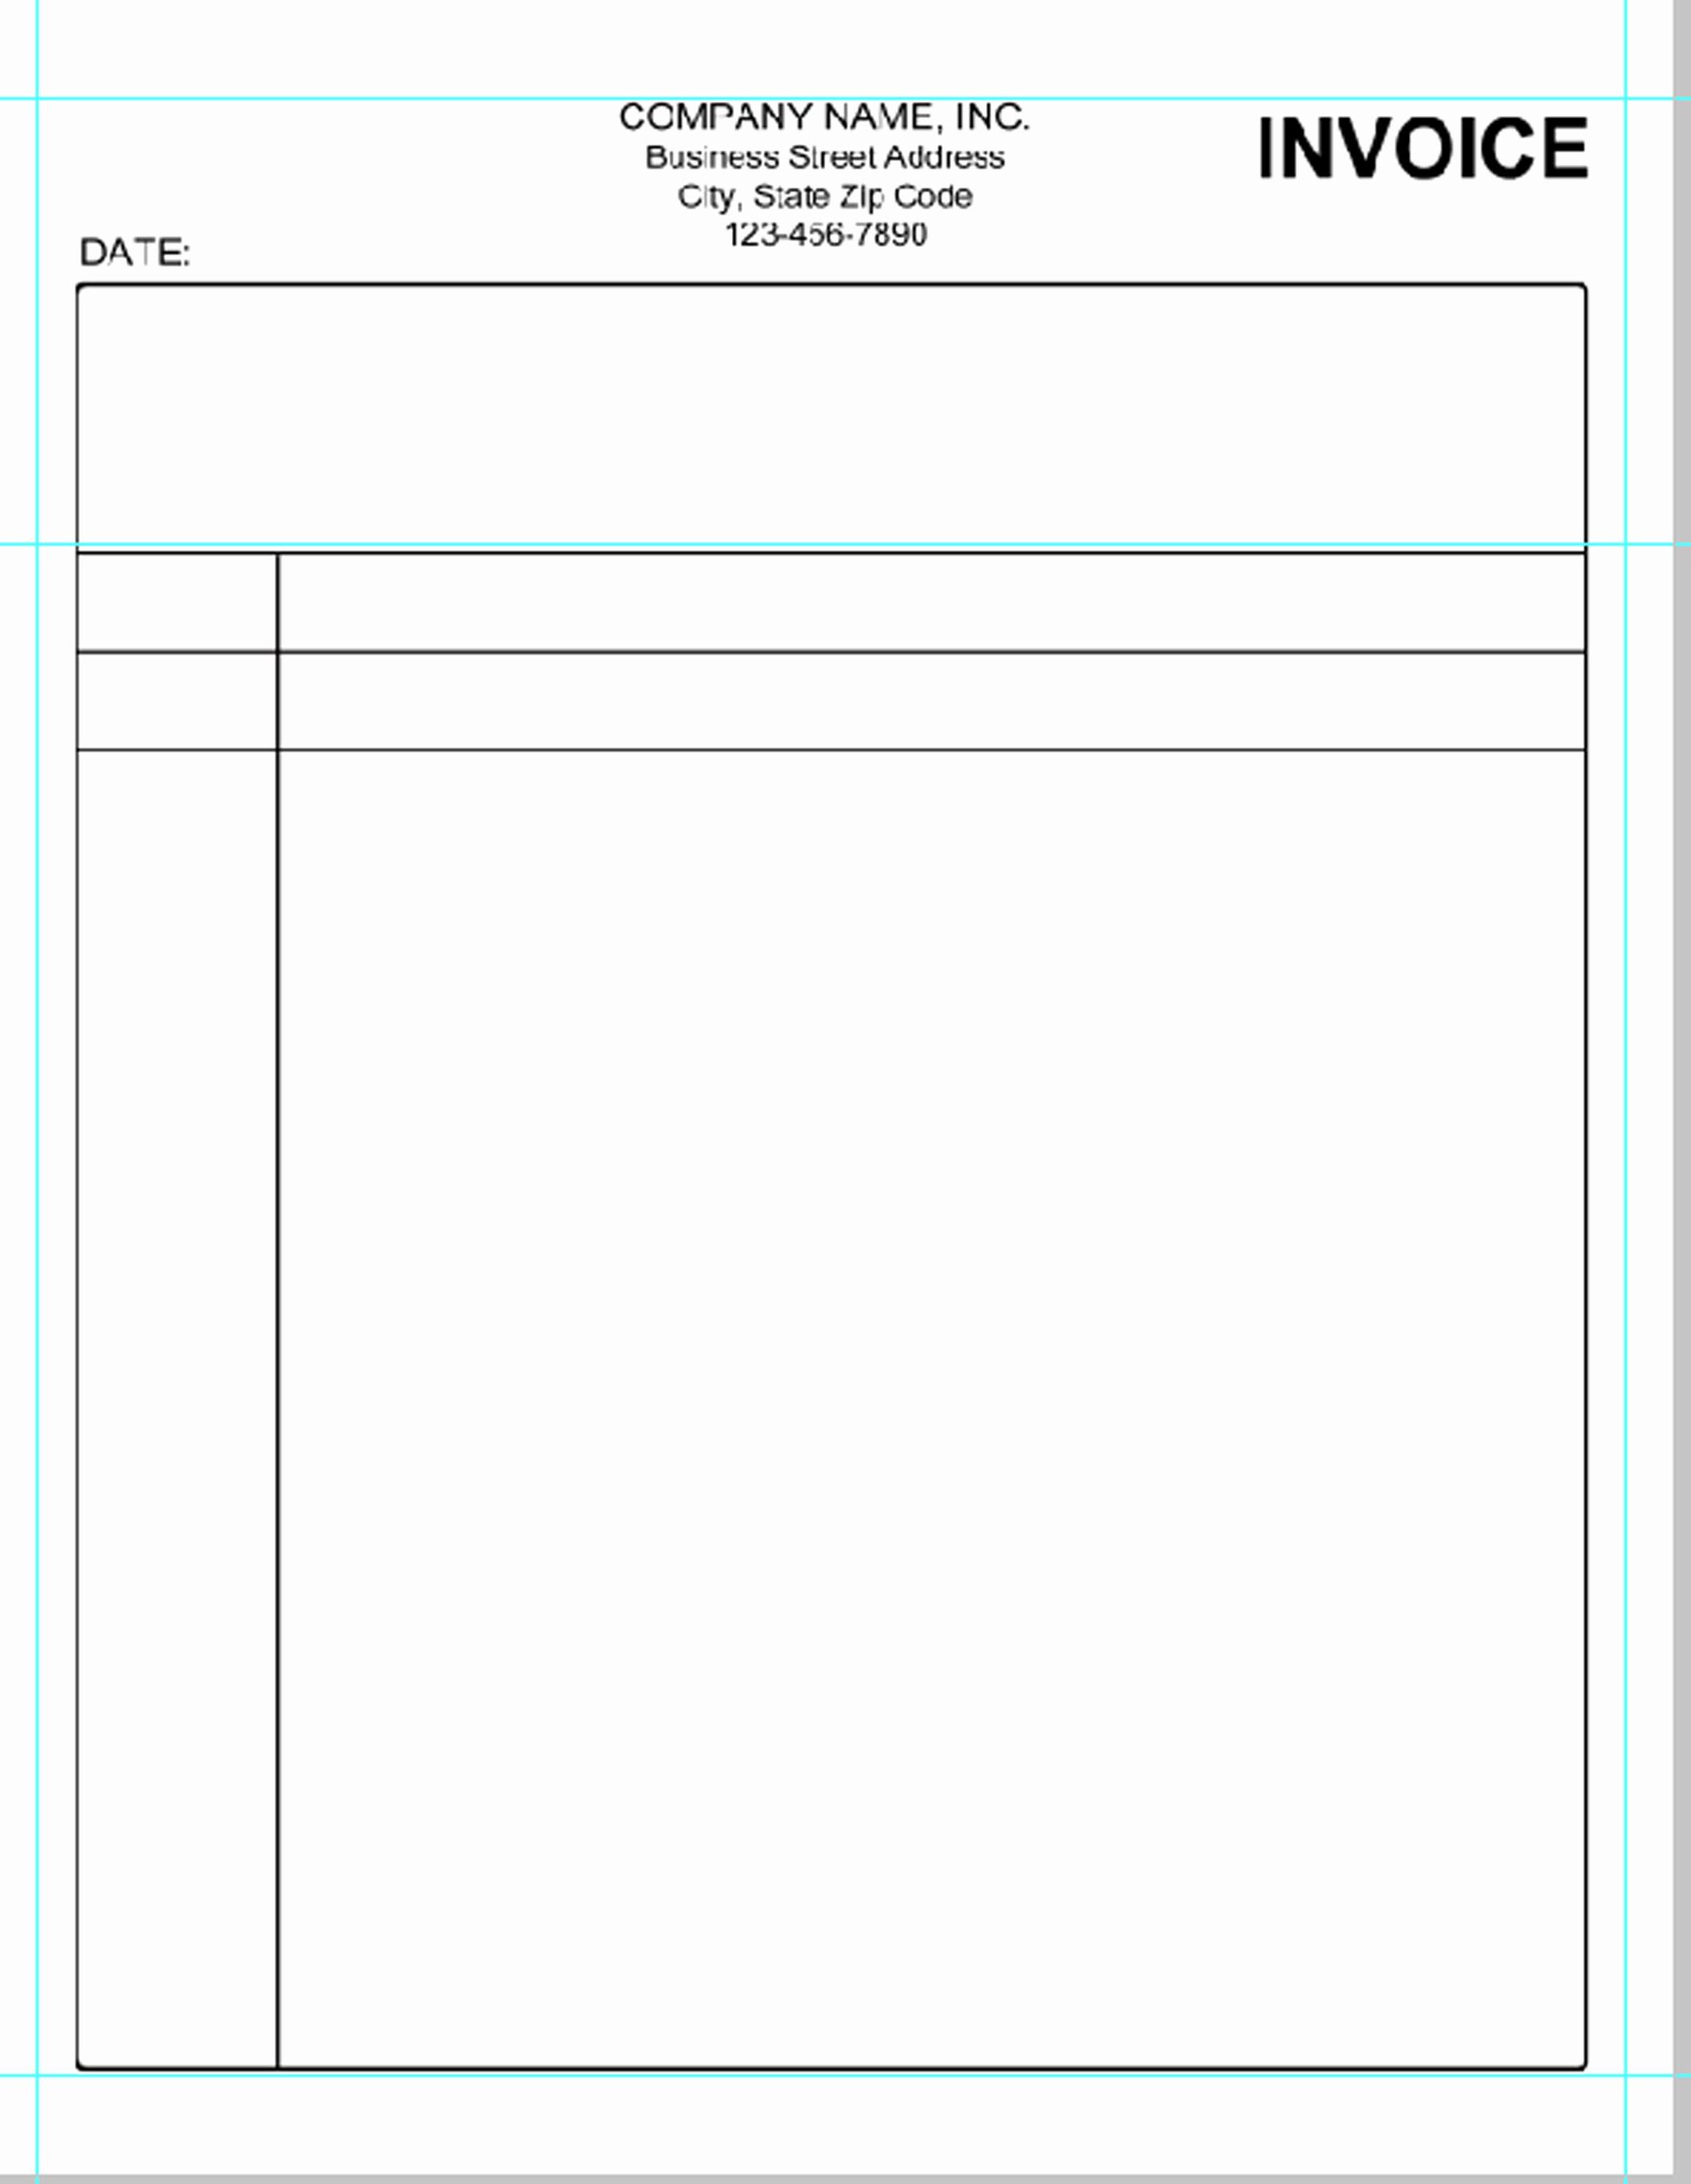 Free Printable Invoice Templates Word Unique Simple Invoice Template Pdf